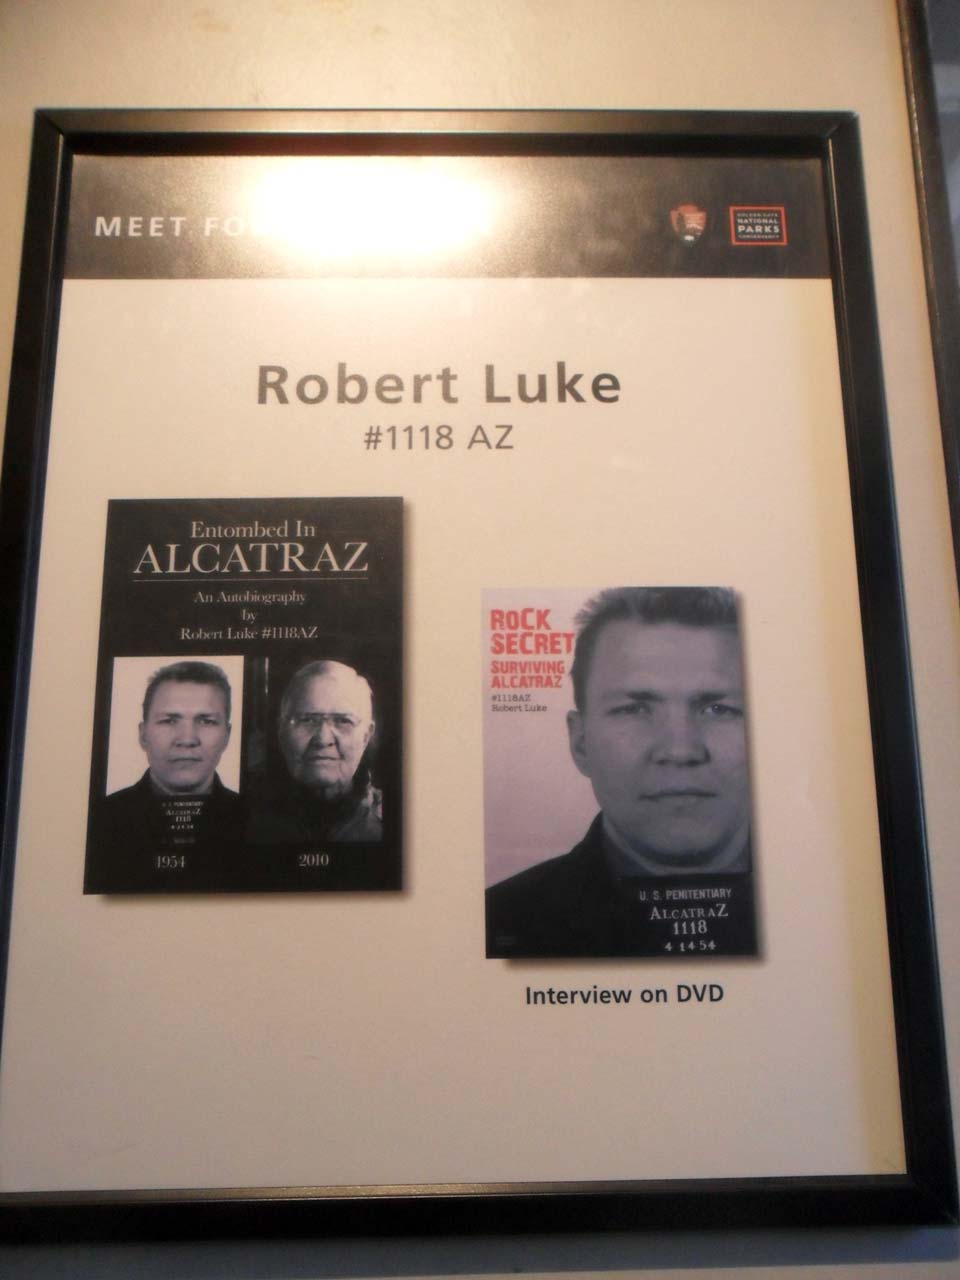 Robert Luke